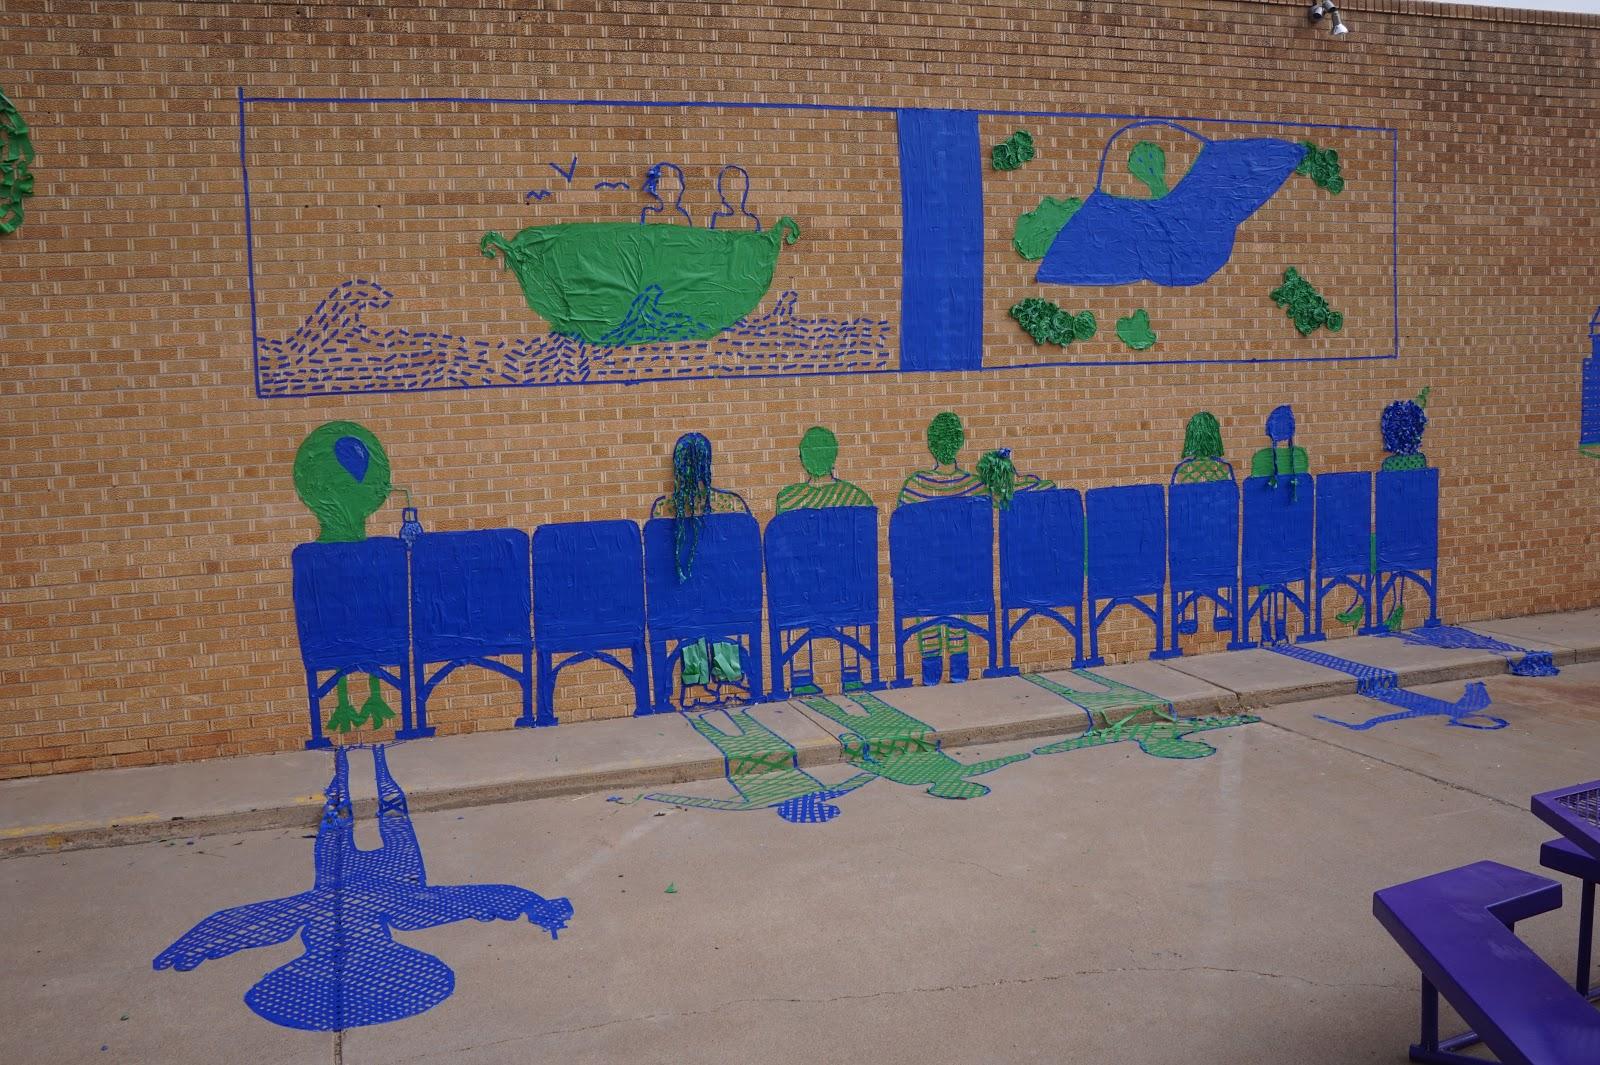 Schoolartsroom Art Education Blog For K 12 Art Teachers March 2019